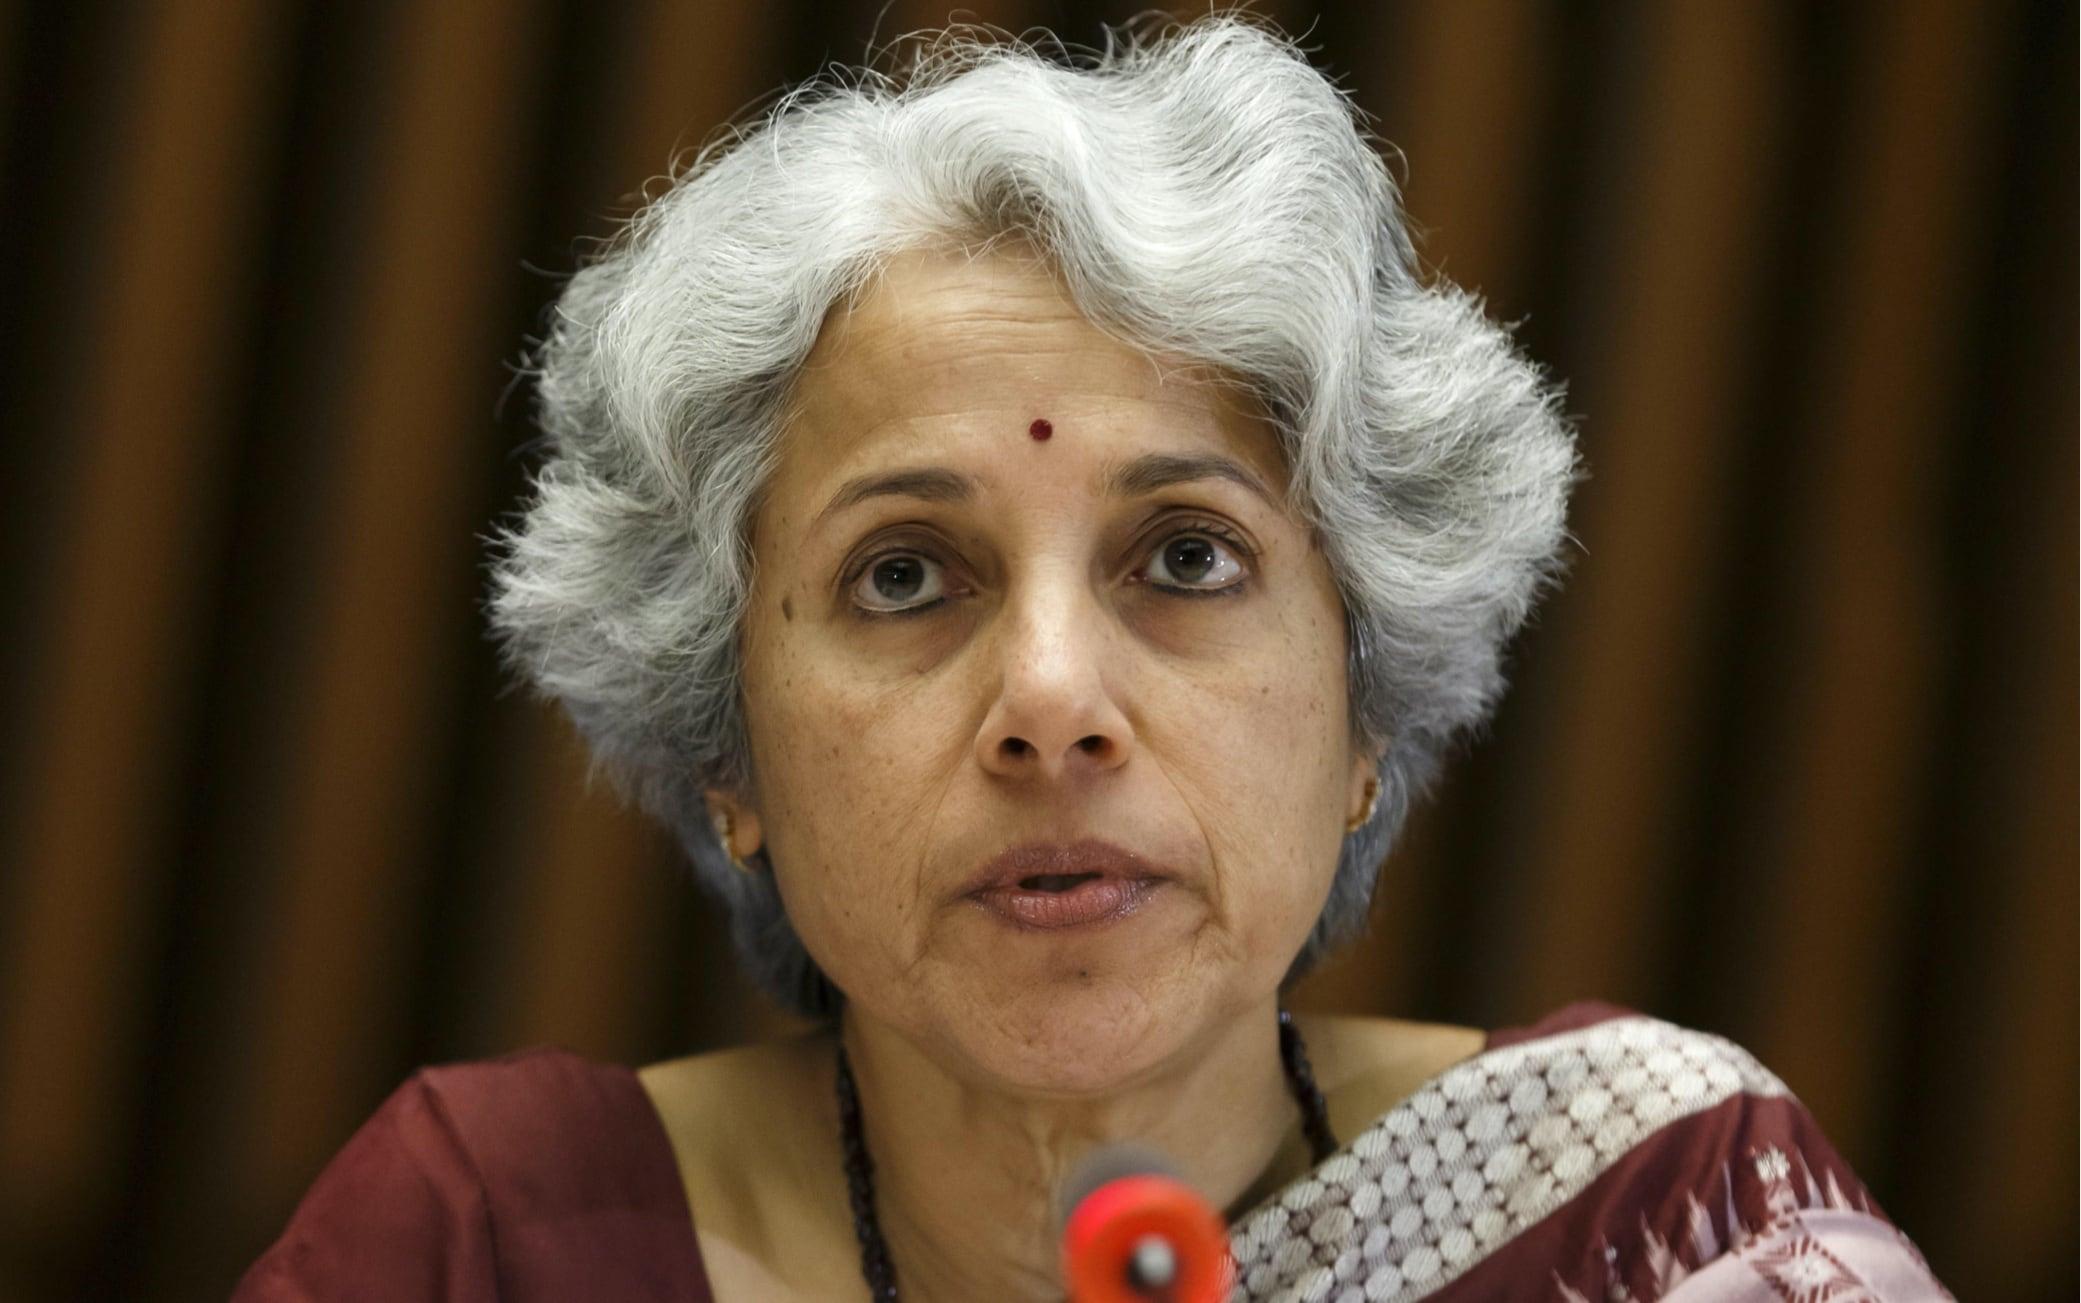 Soumya Swaminathan ricercatrice capo dell'Oms